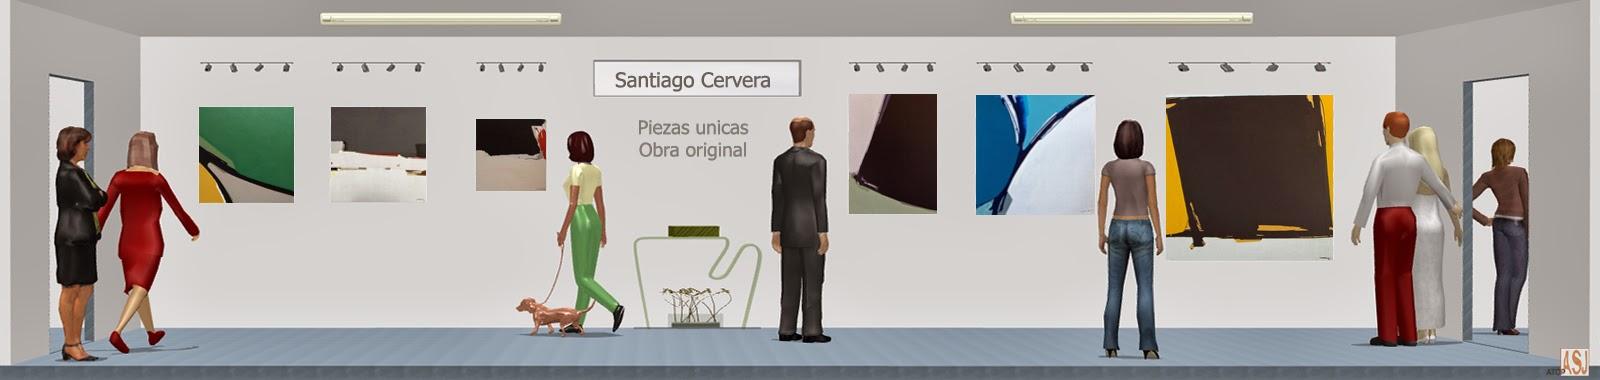 "<img src="" http://4.bp.blogspot.com/-PHsw-j6xyME/U_yVm6UeDdI/AAAAAAAAbbE/W_NhFpGH3kw/s1600/sala-de-exposicion-de-santi-cervera.jpg"" alt=""Sala de Exposición virtual de pinturas de Santi Cervera""/>"